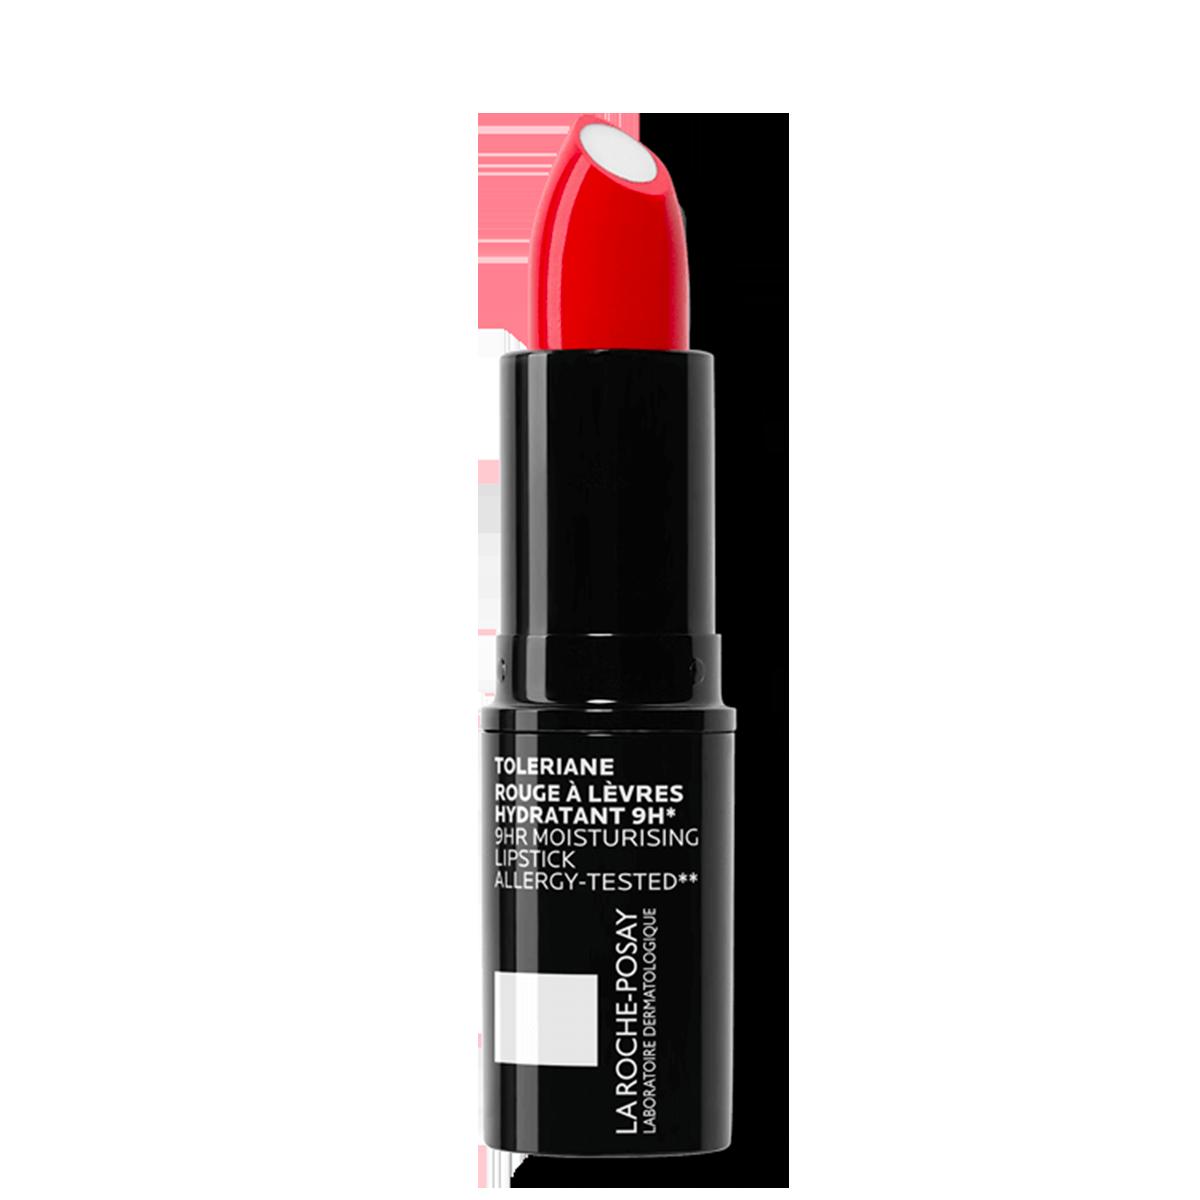 La Roche Posay Herkkä Toleriane Make up NOVALIP 191PurRouge 3009270